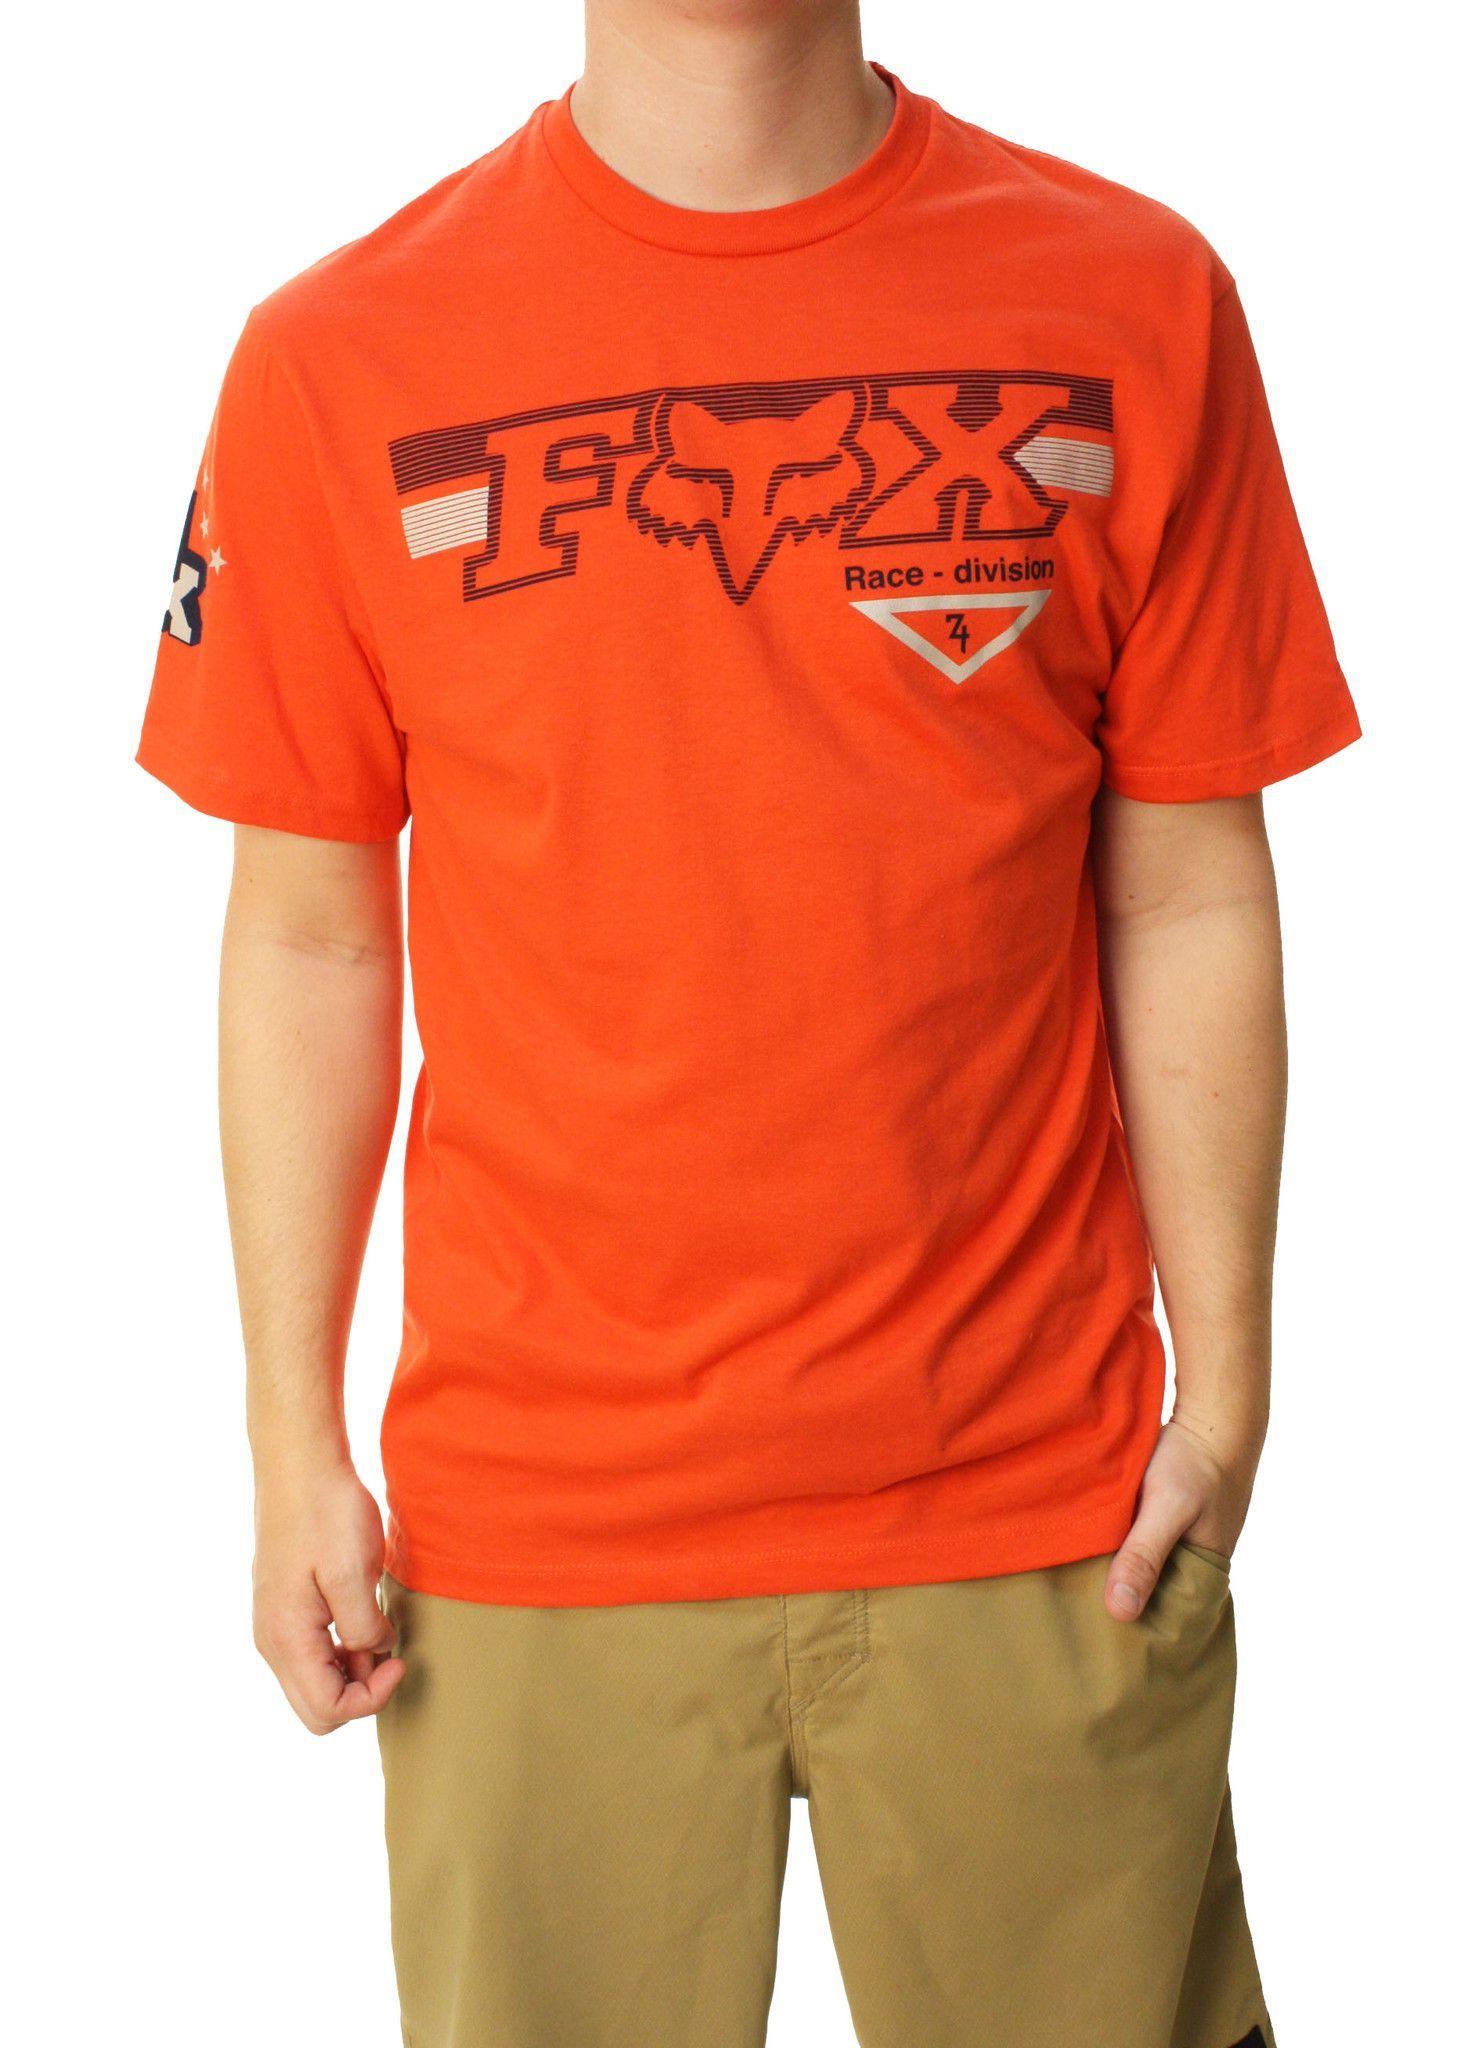 quality design 6aed7 ae297 Fox Racing Men s Engine Eruption Short Sleeve Crew Neck T-Shirt